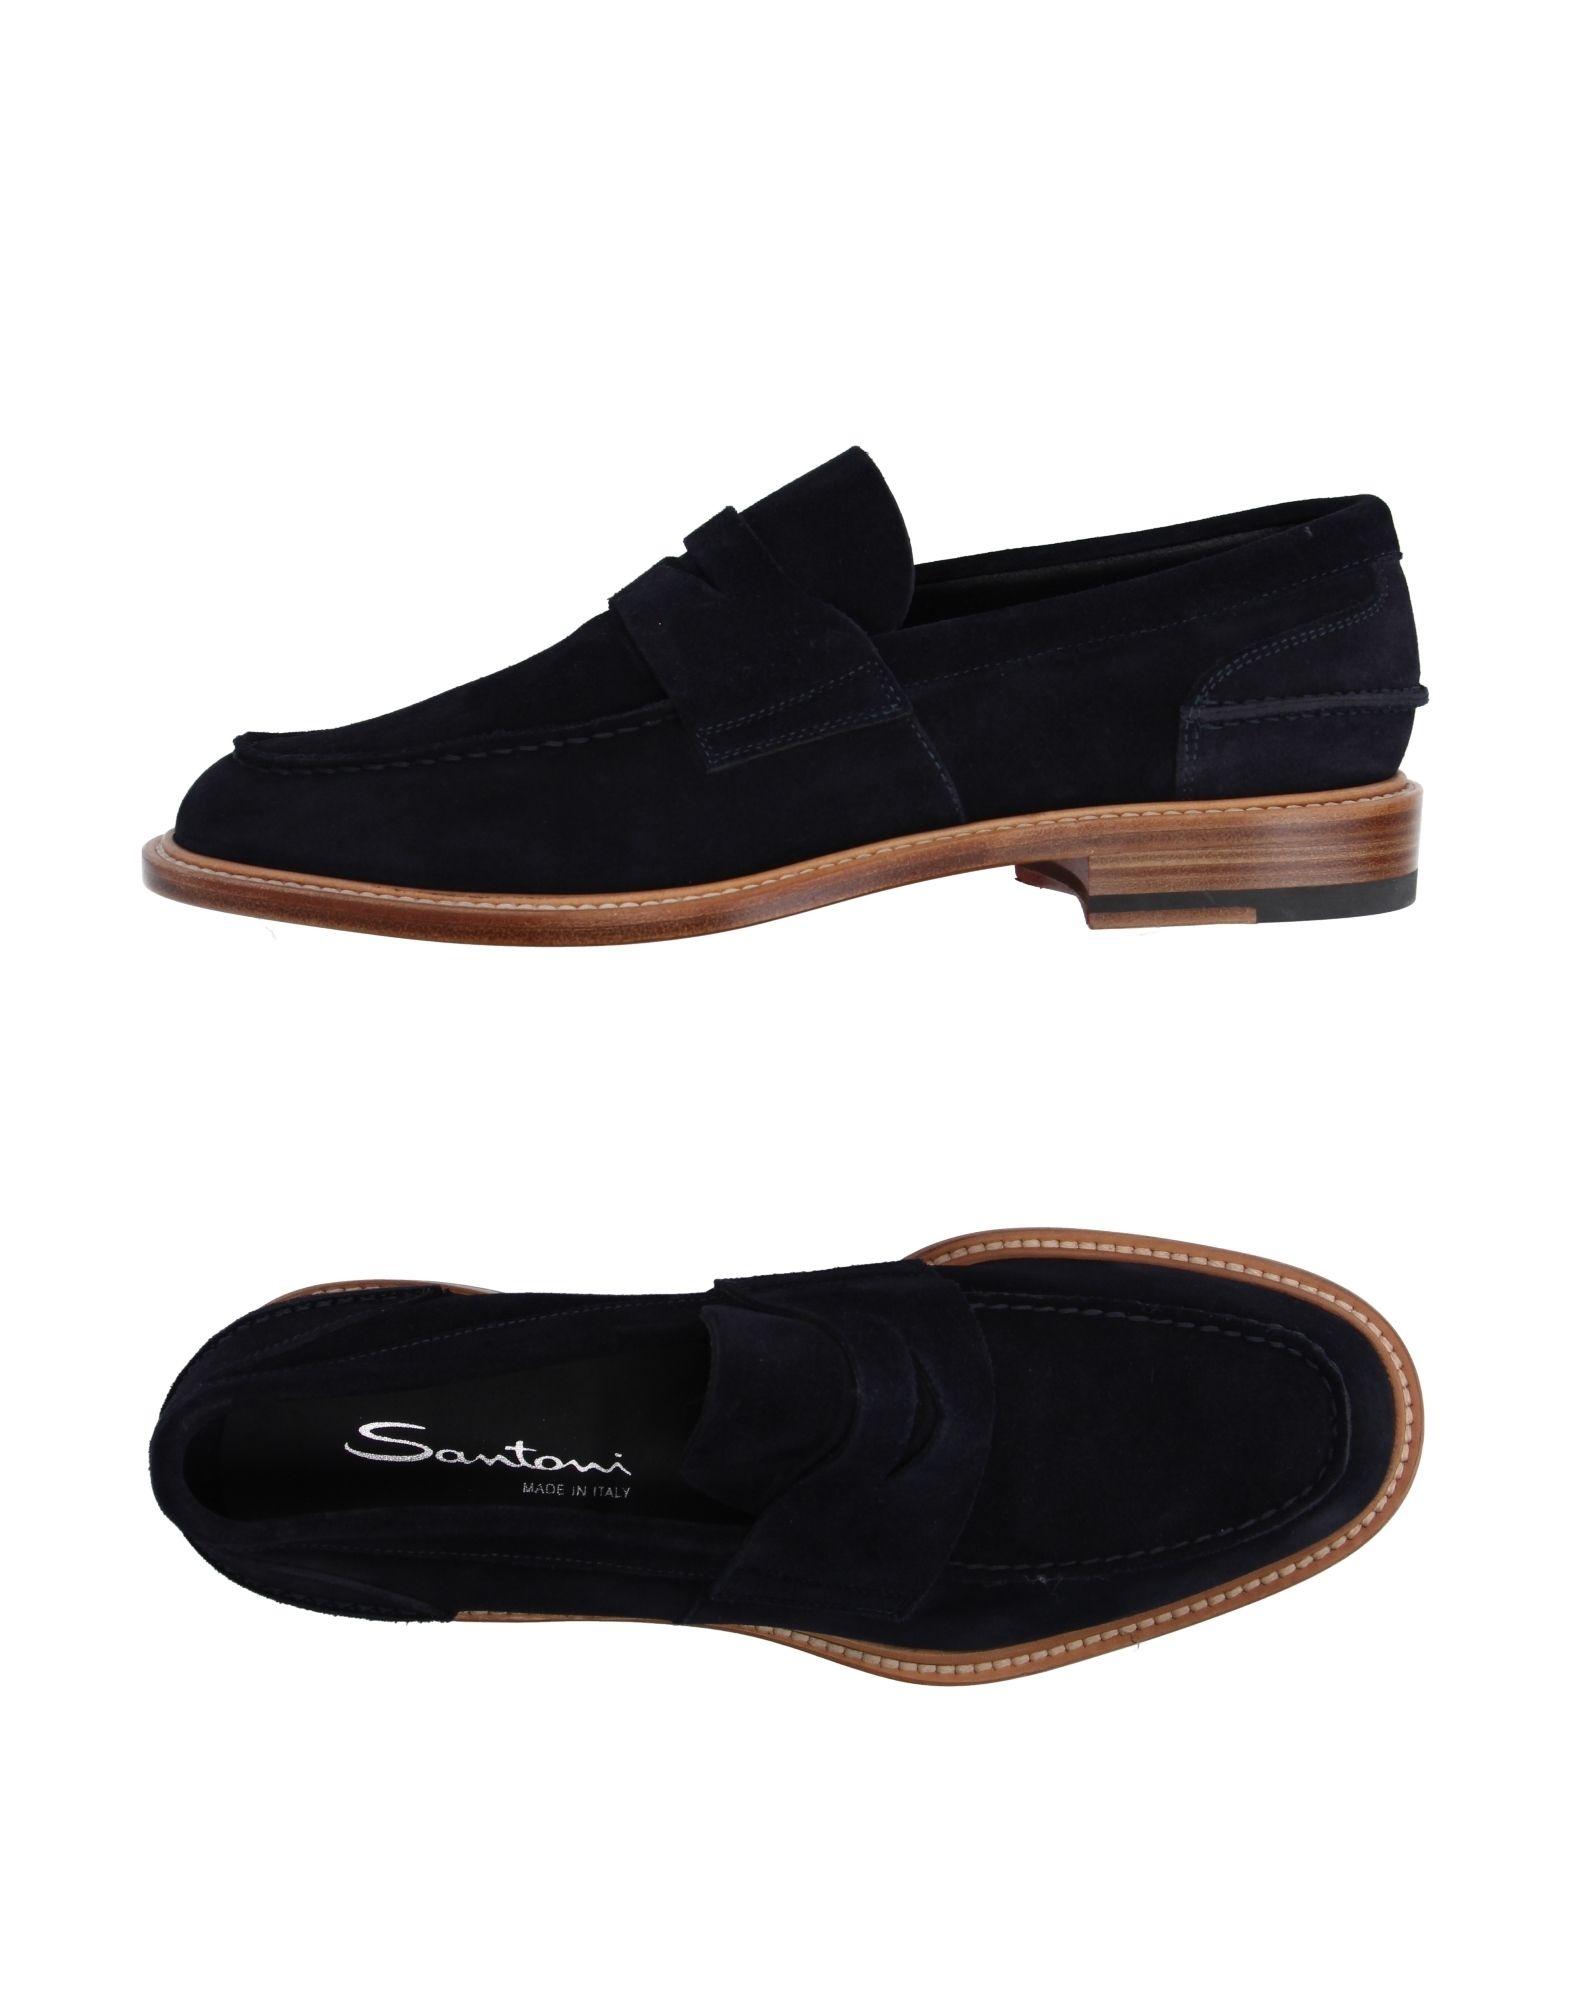 Santoni Mokassins Herren  11184980SA Gute Qualität beliebte Schuhe